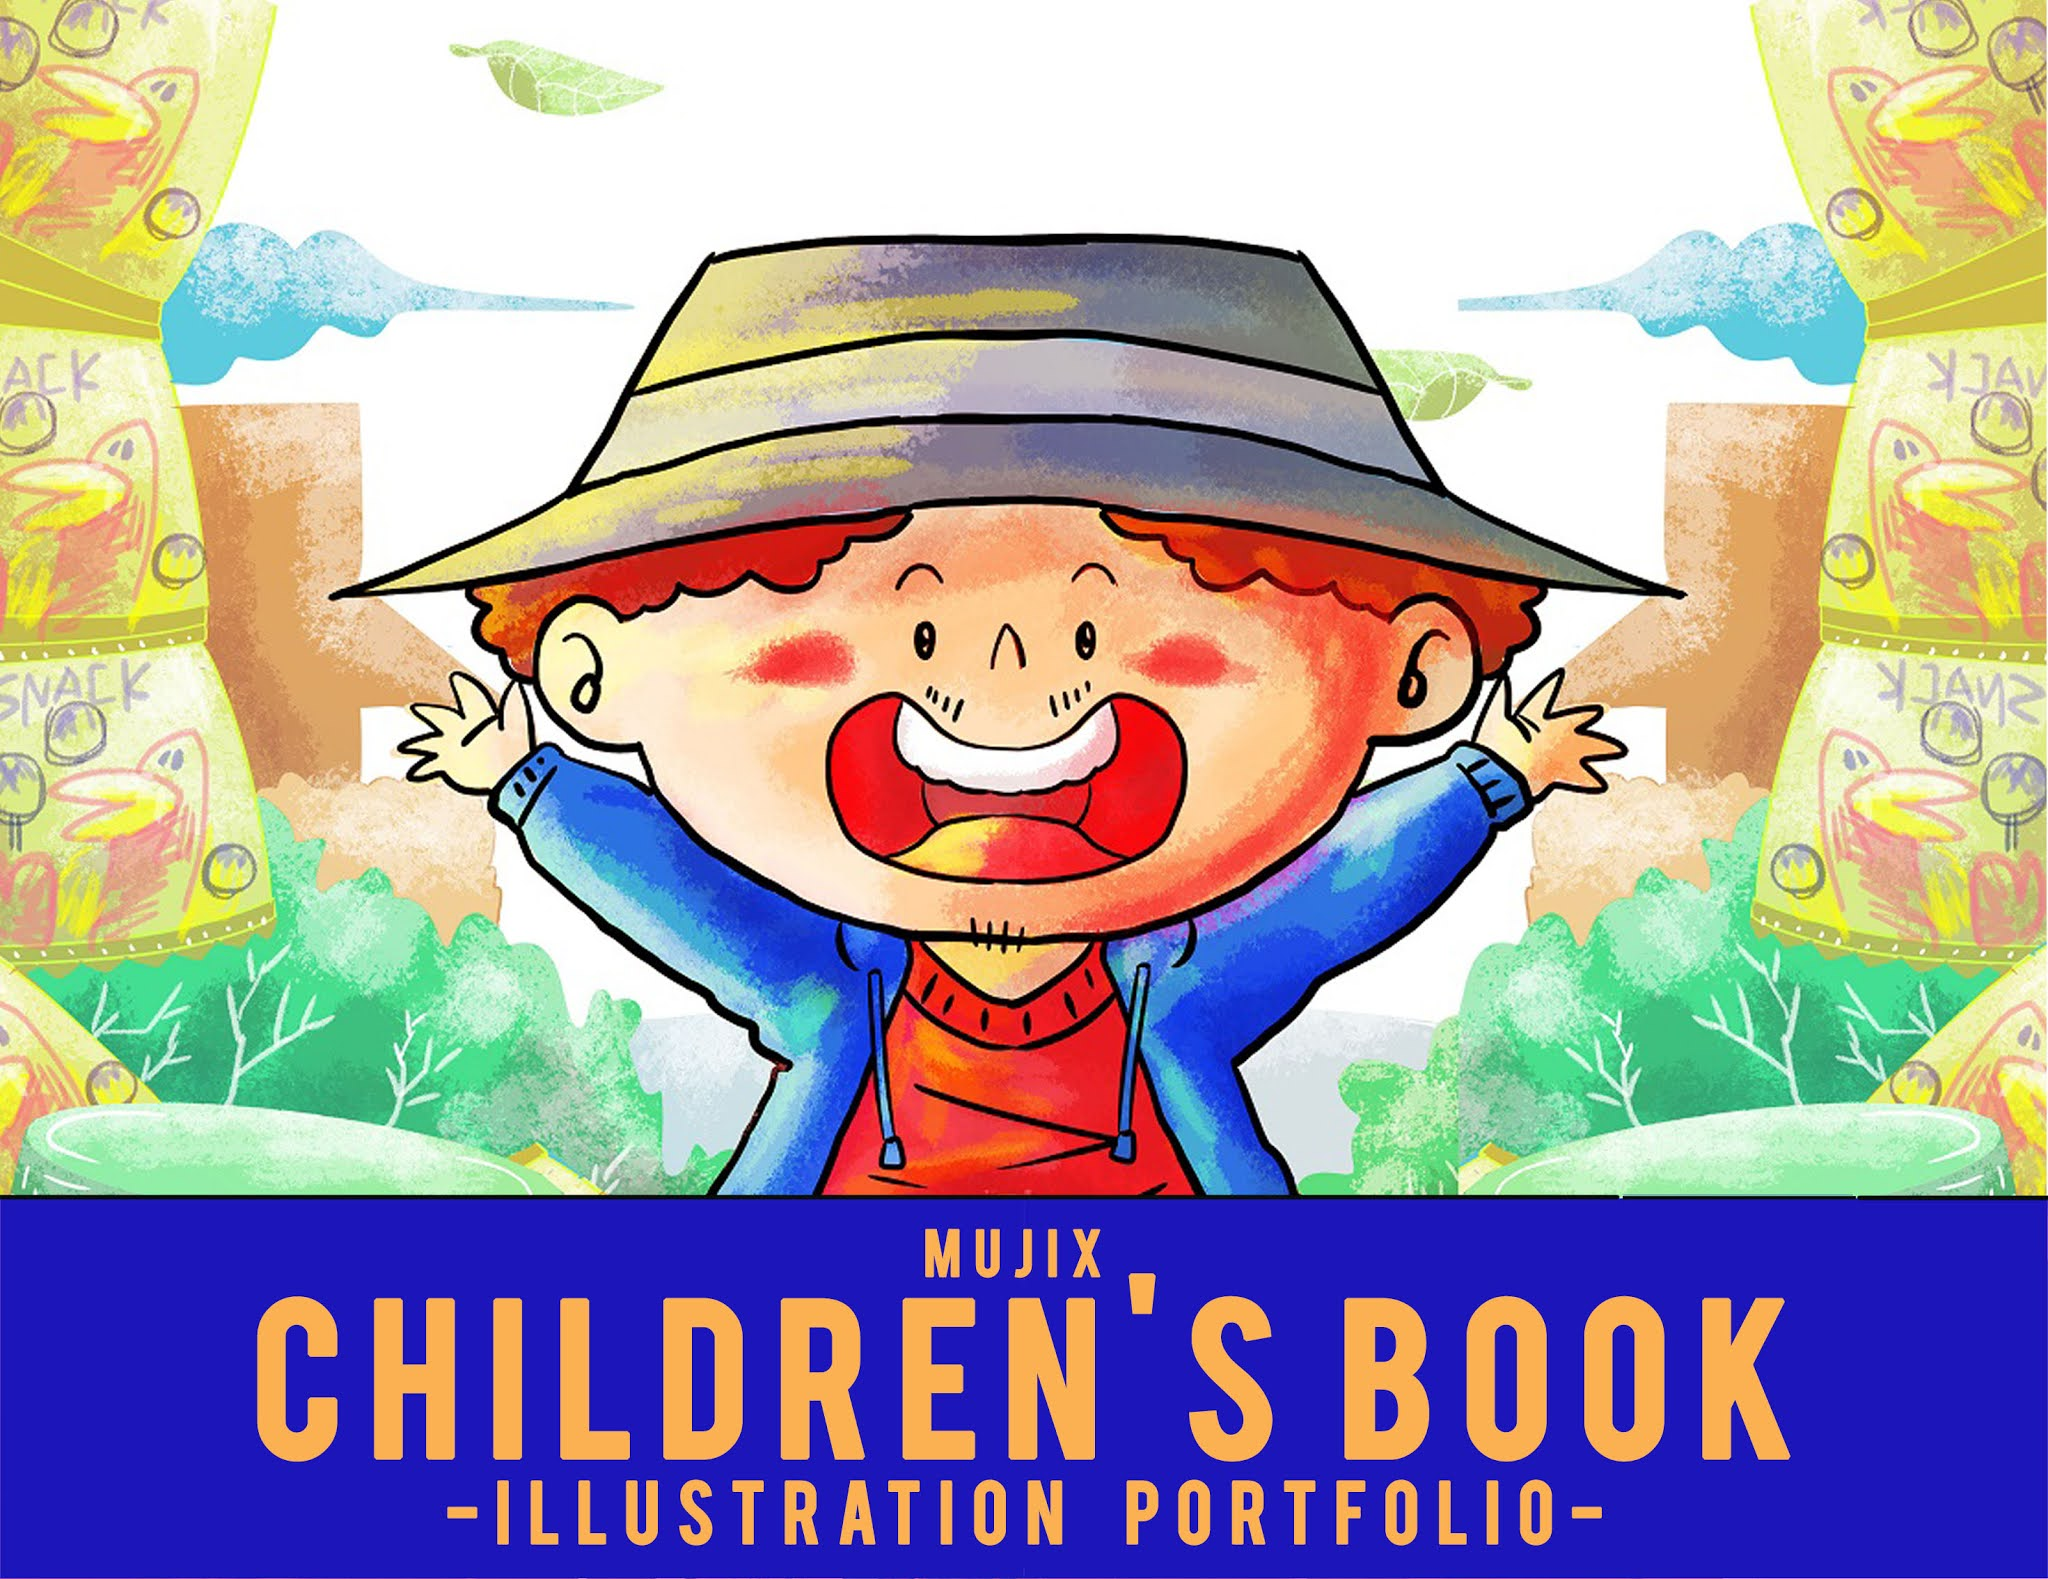 CHILDRENS BOOK ILLUSTRATION MUJIX